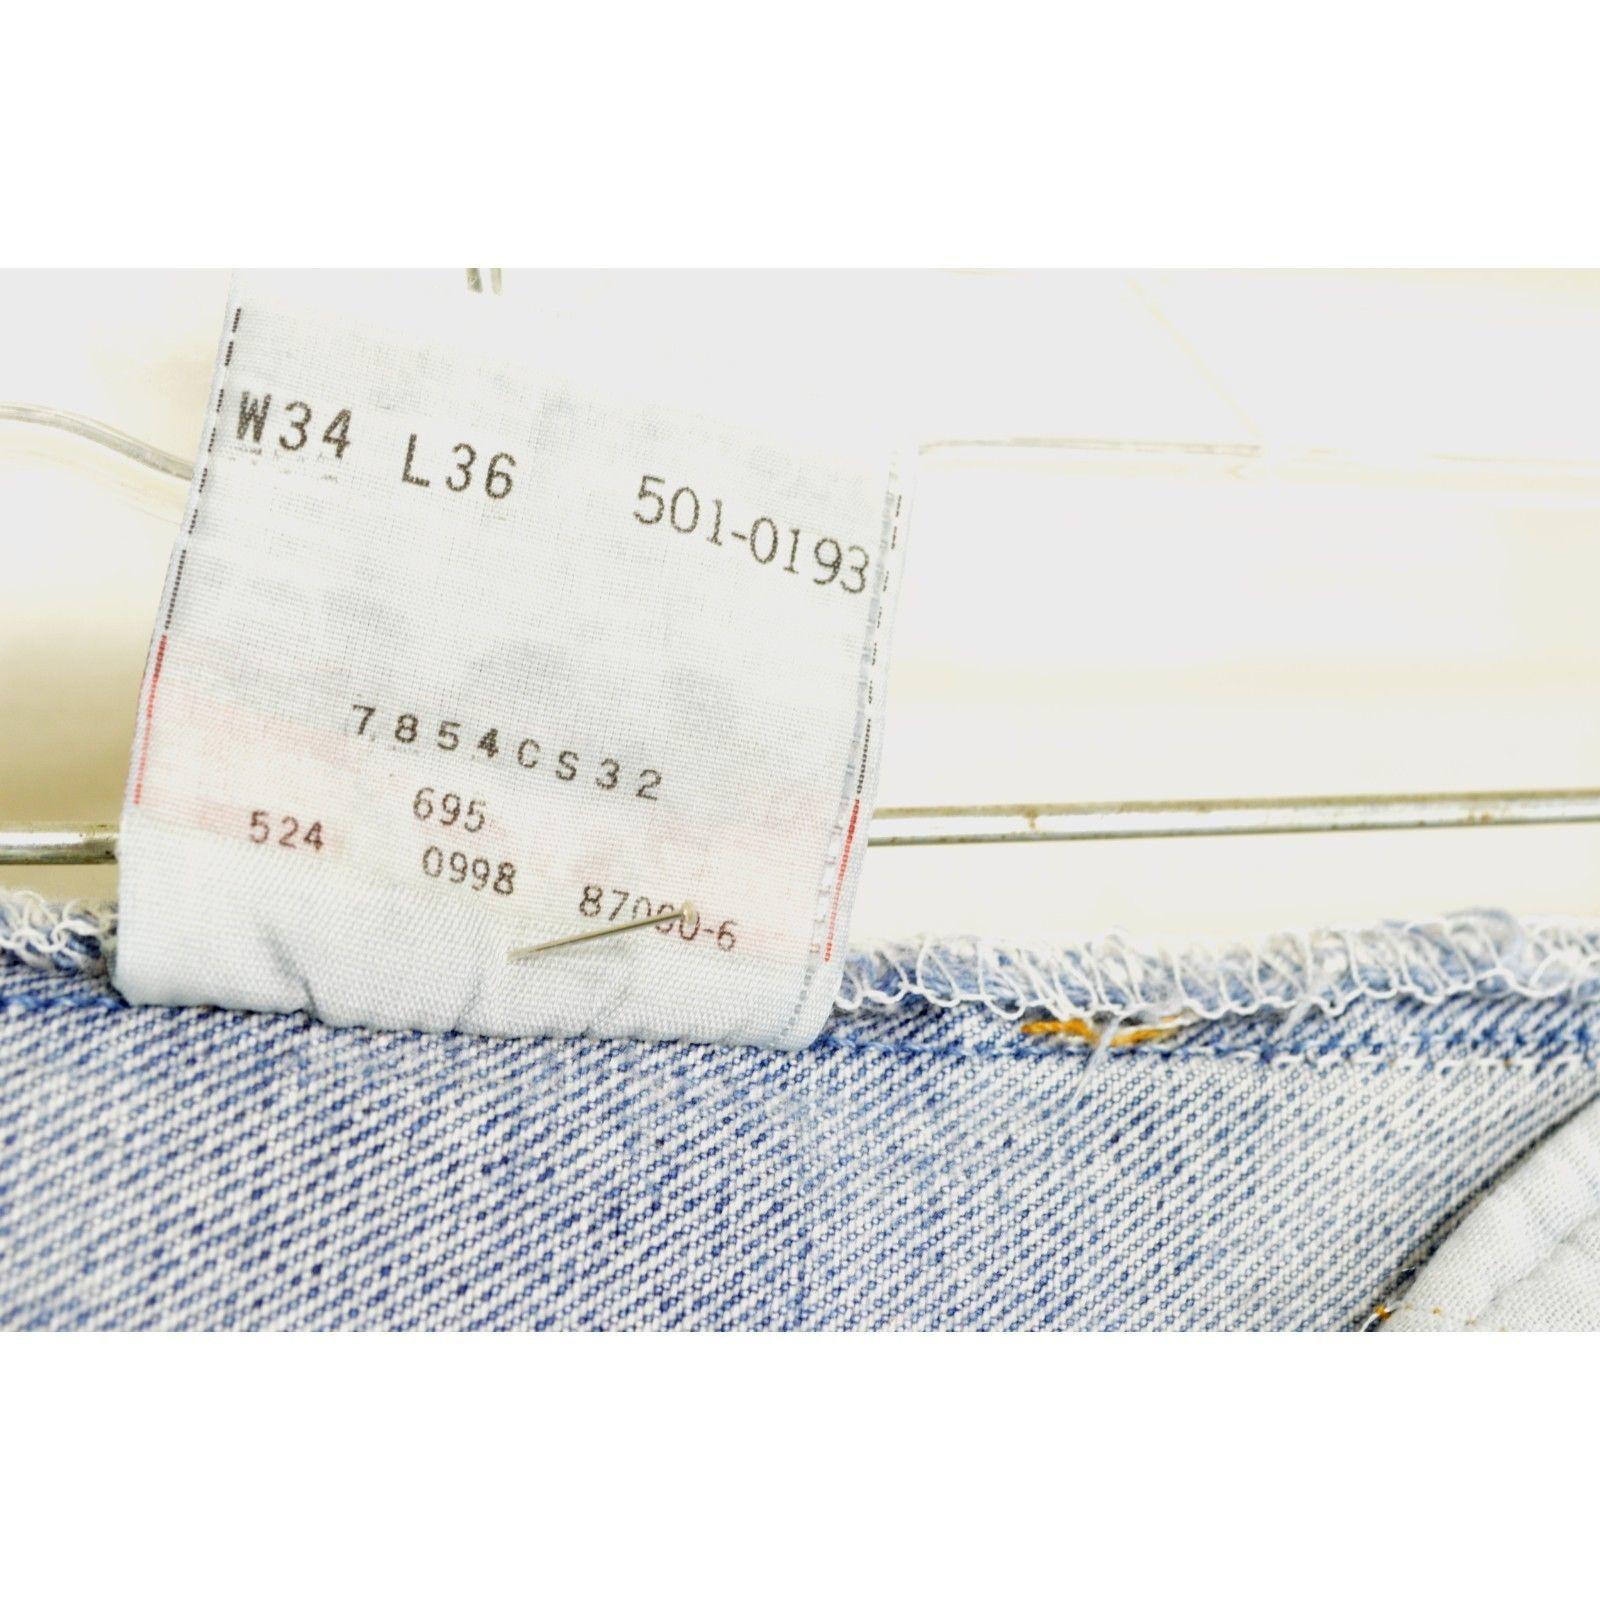 Levi 501 jean 34 x 36 vintage straight button fly classic high waist mom USA